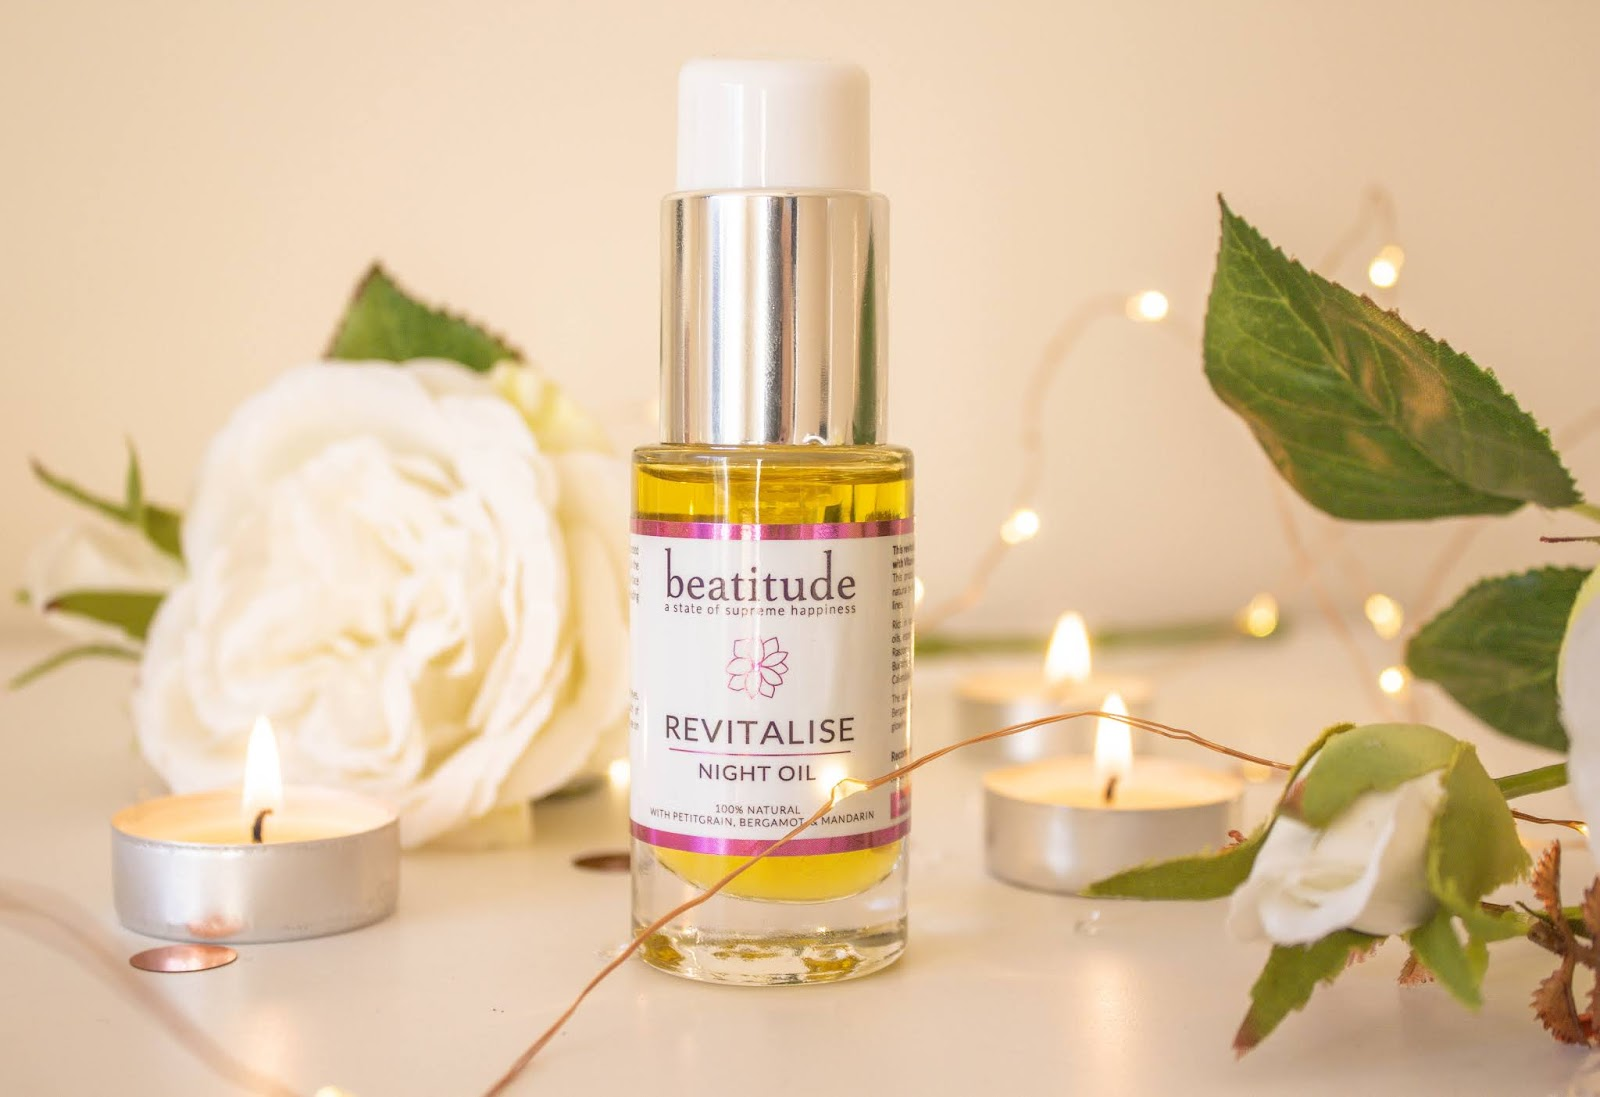 Beatitude Revitalise Night Facial Oil Review